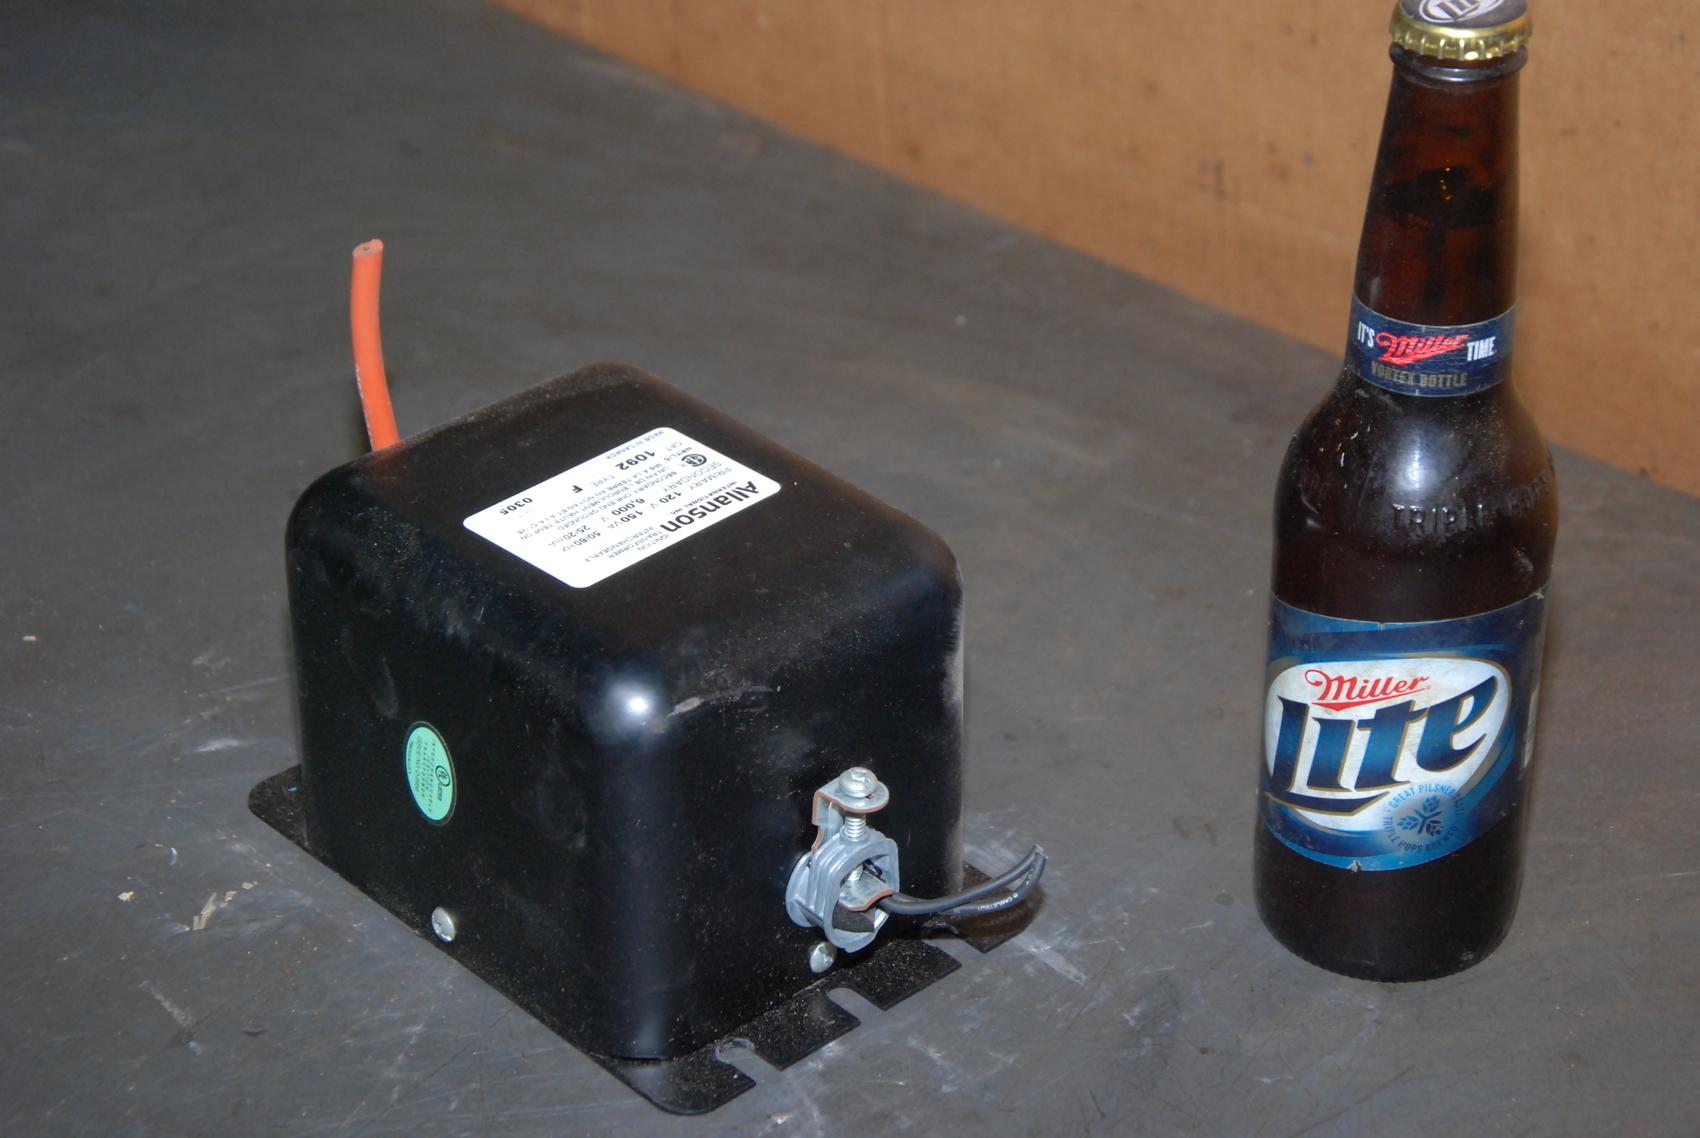 Allanson 1092 Gas Burner Ignition Transformer